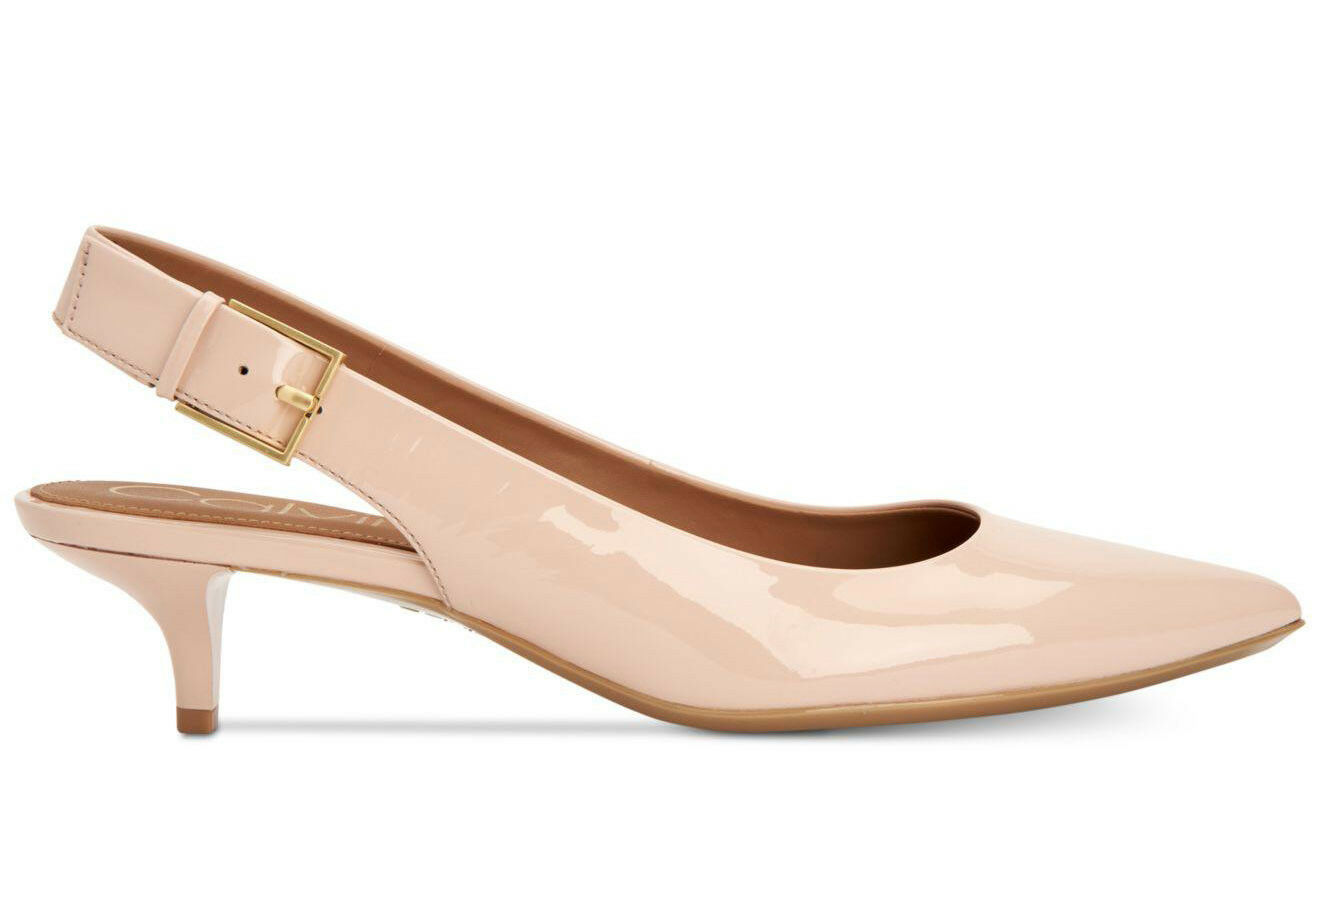 6 6,5 CALVIN KLEIN LUKA SHEER SATIN PATENT LEATHER WOMEN'S KITTEN HEELS Schuhe